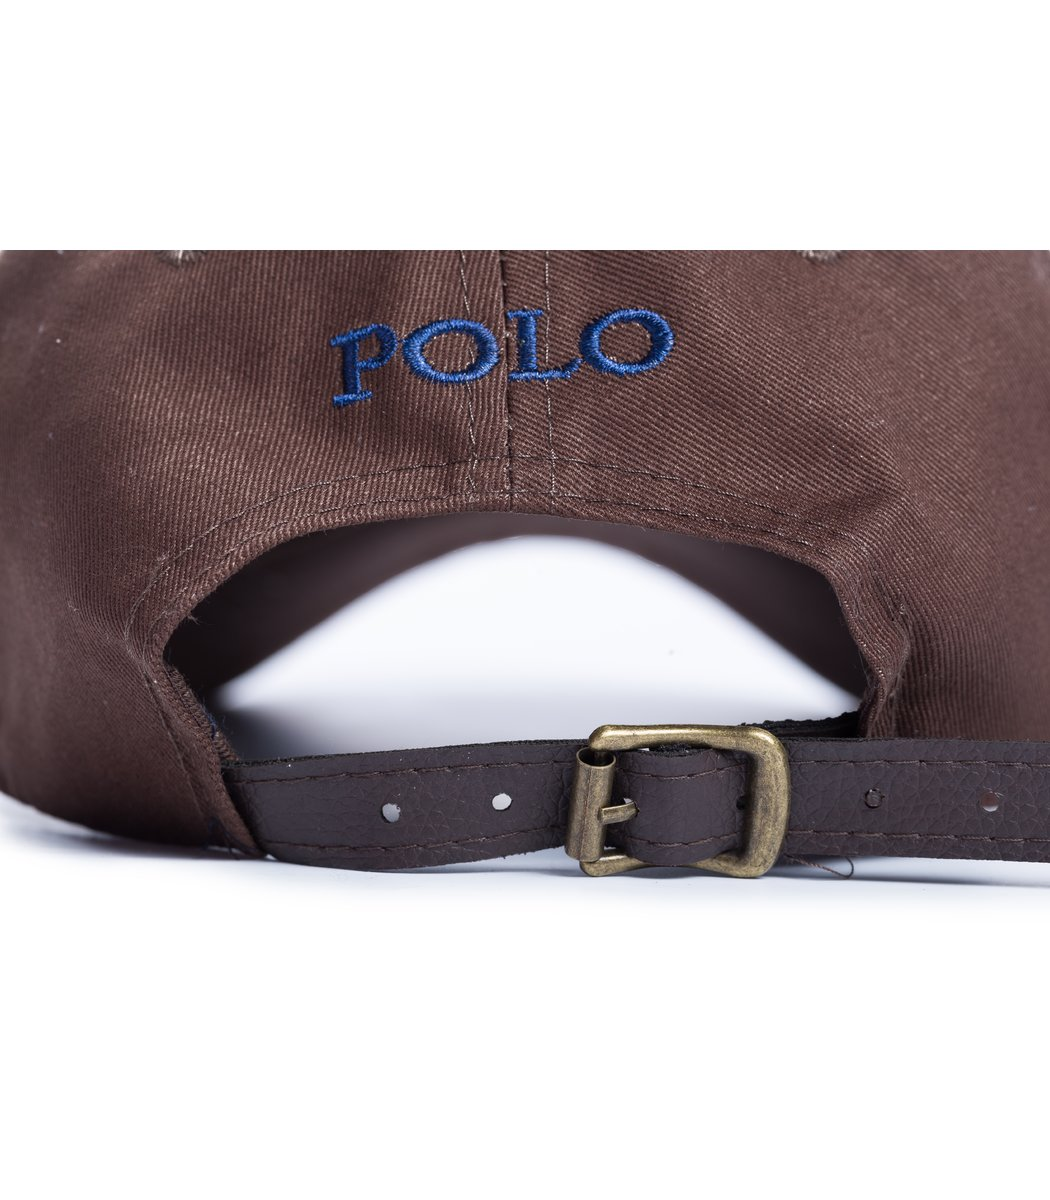 Кепка POLO Ralph Lauren Premiere Коричневый/синий - Коричневый - Вид 3